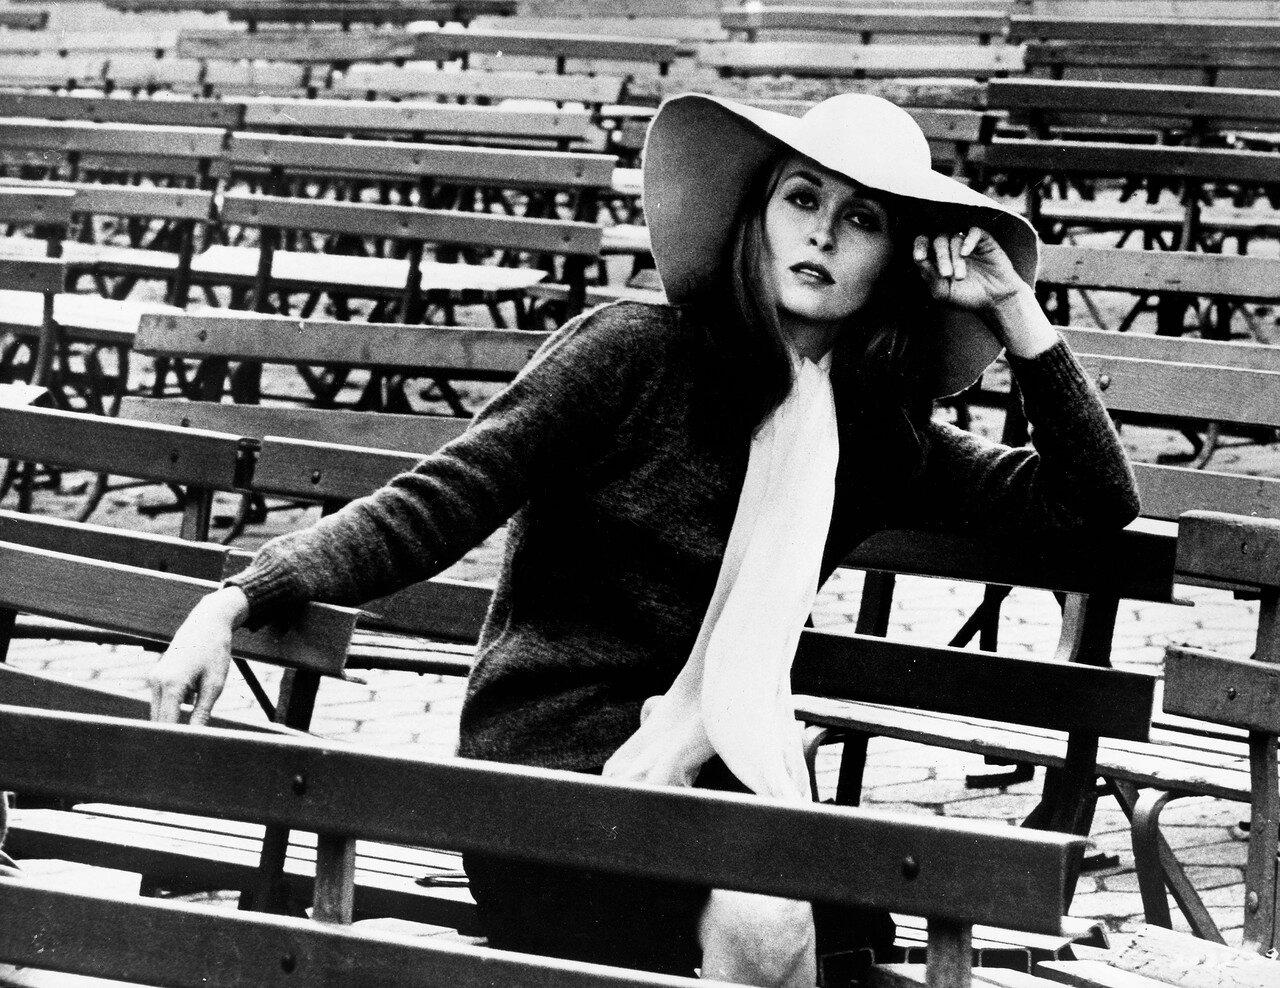 Actress Faye Dunaway